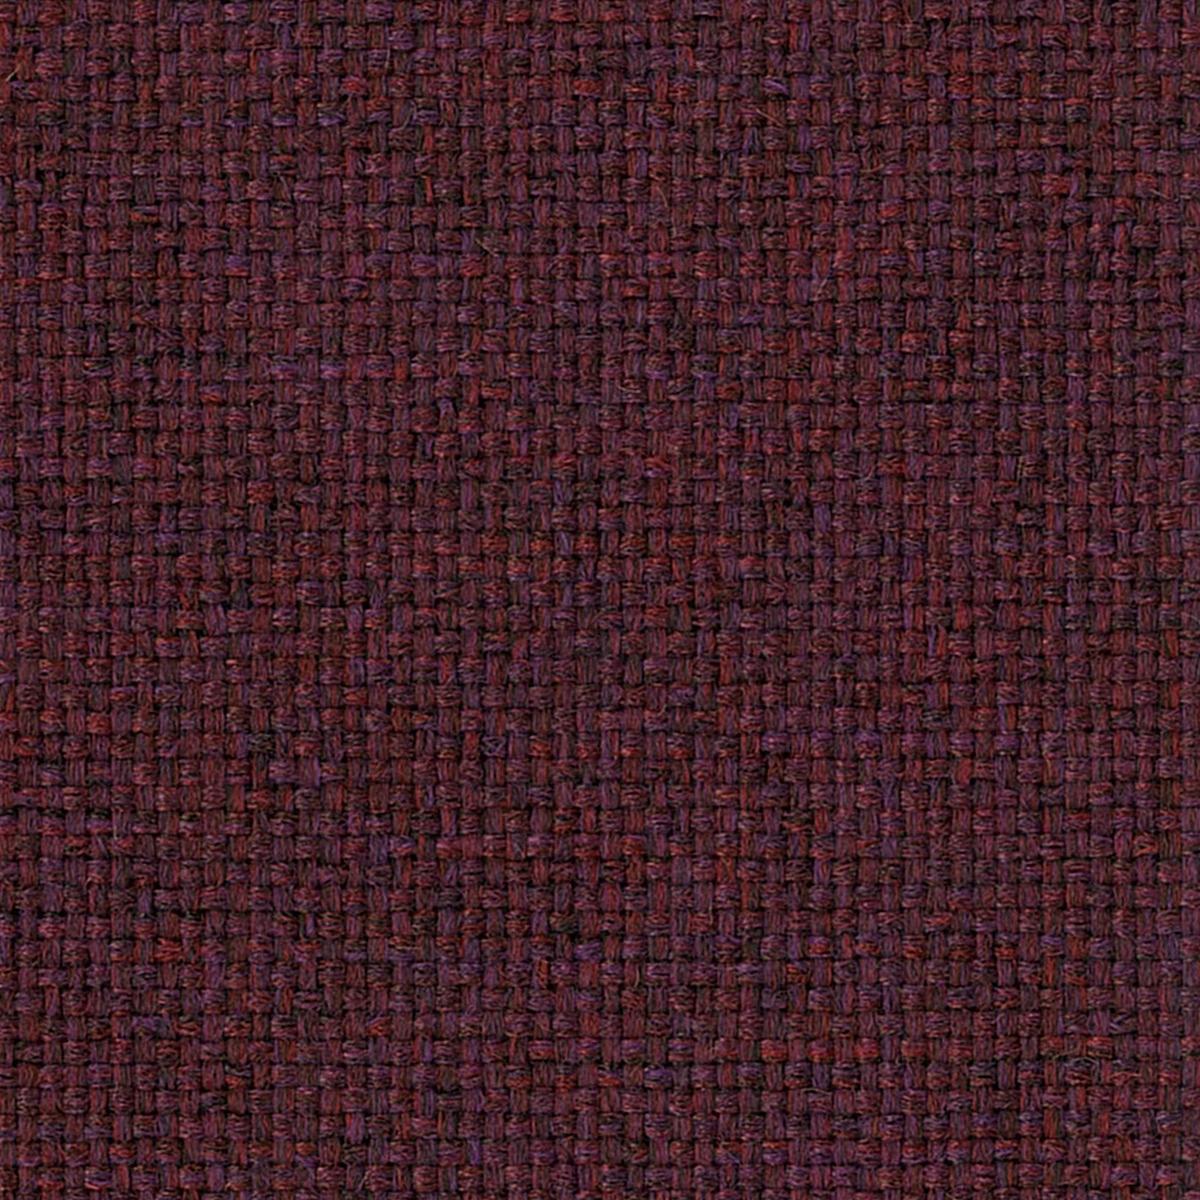 Purple • Violet • Plum